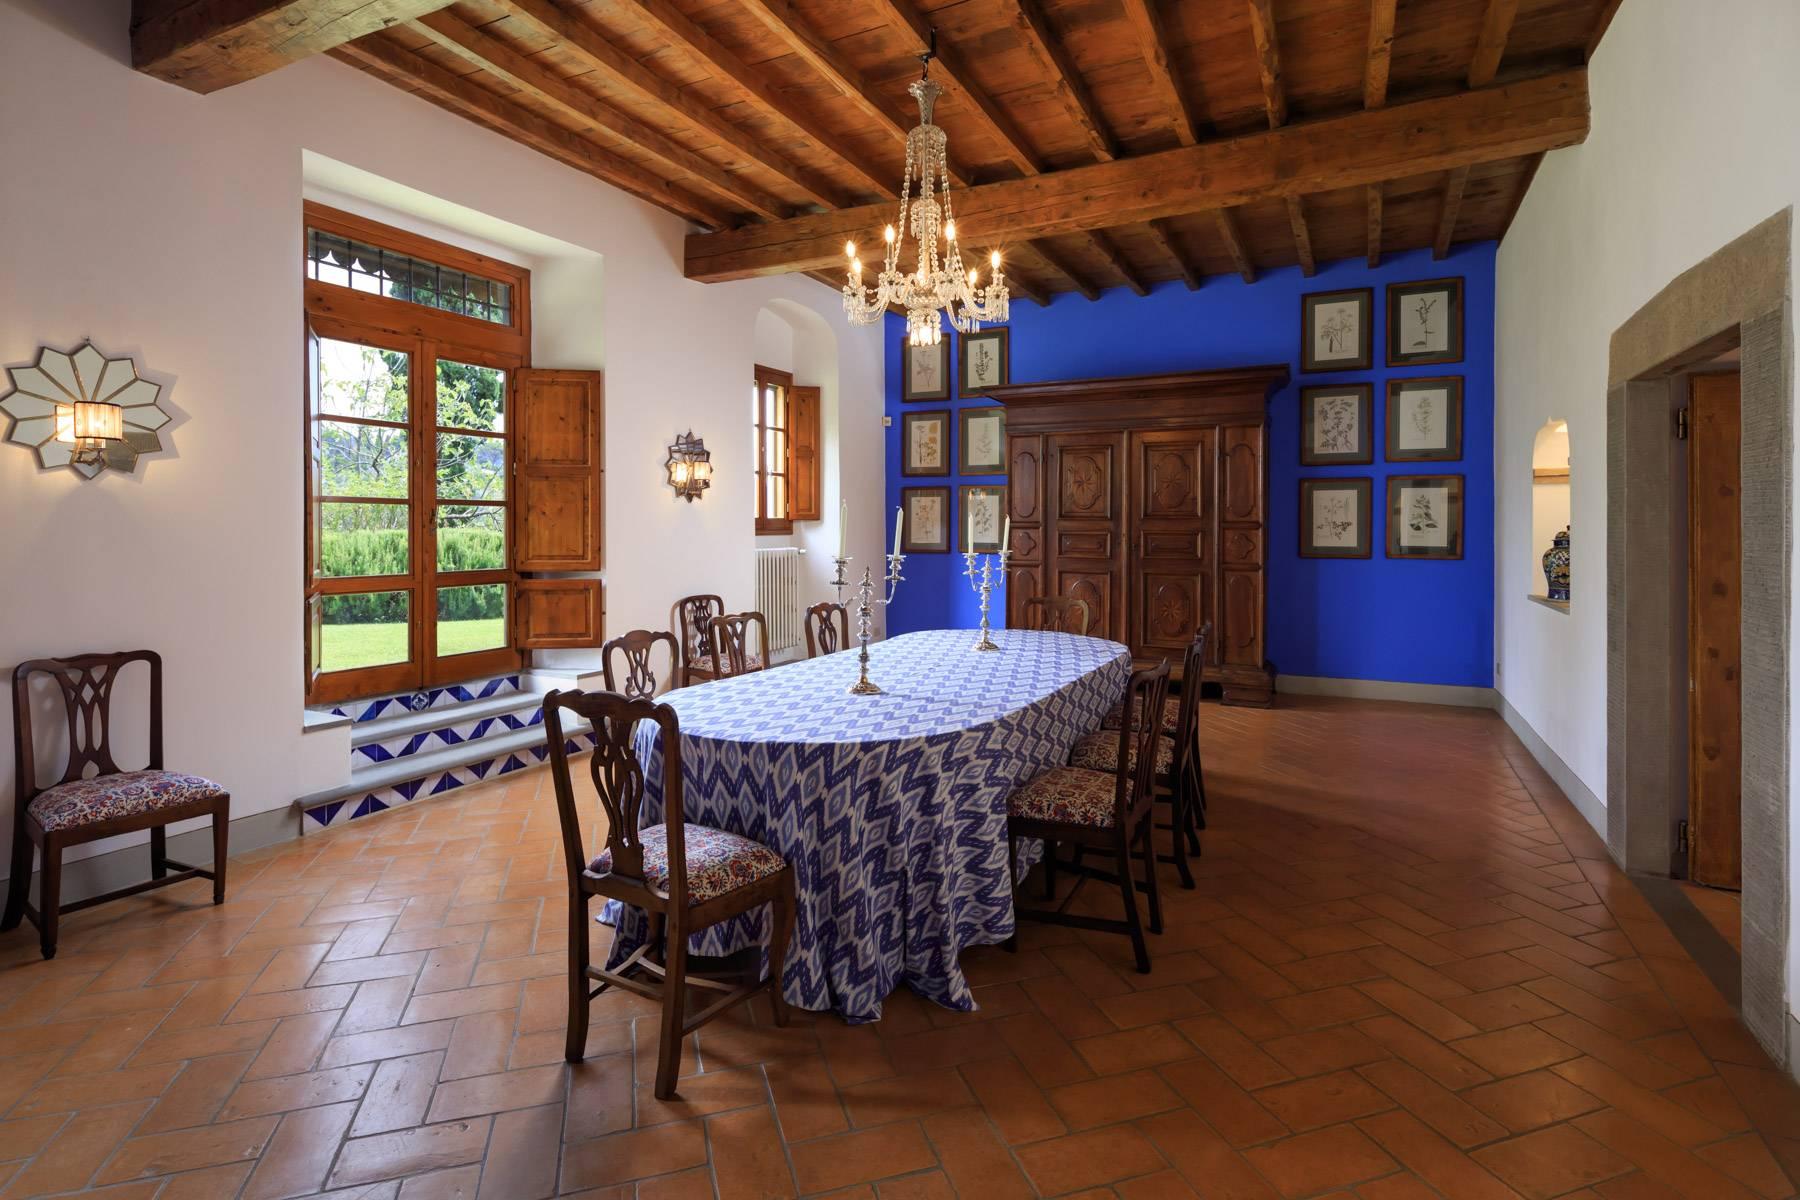 Villa in Affitto a Firenze: 5 locali, 600 mq - Foto 12